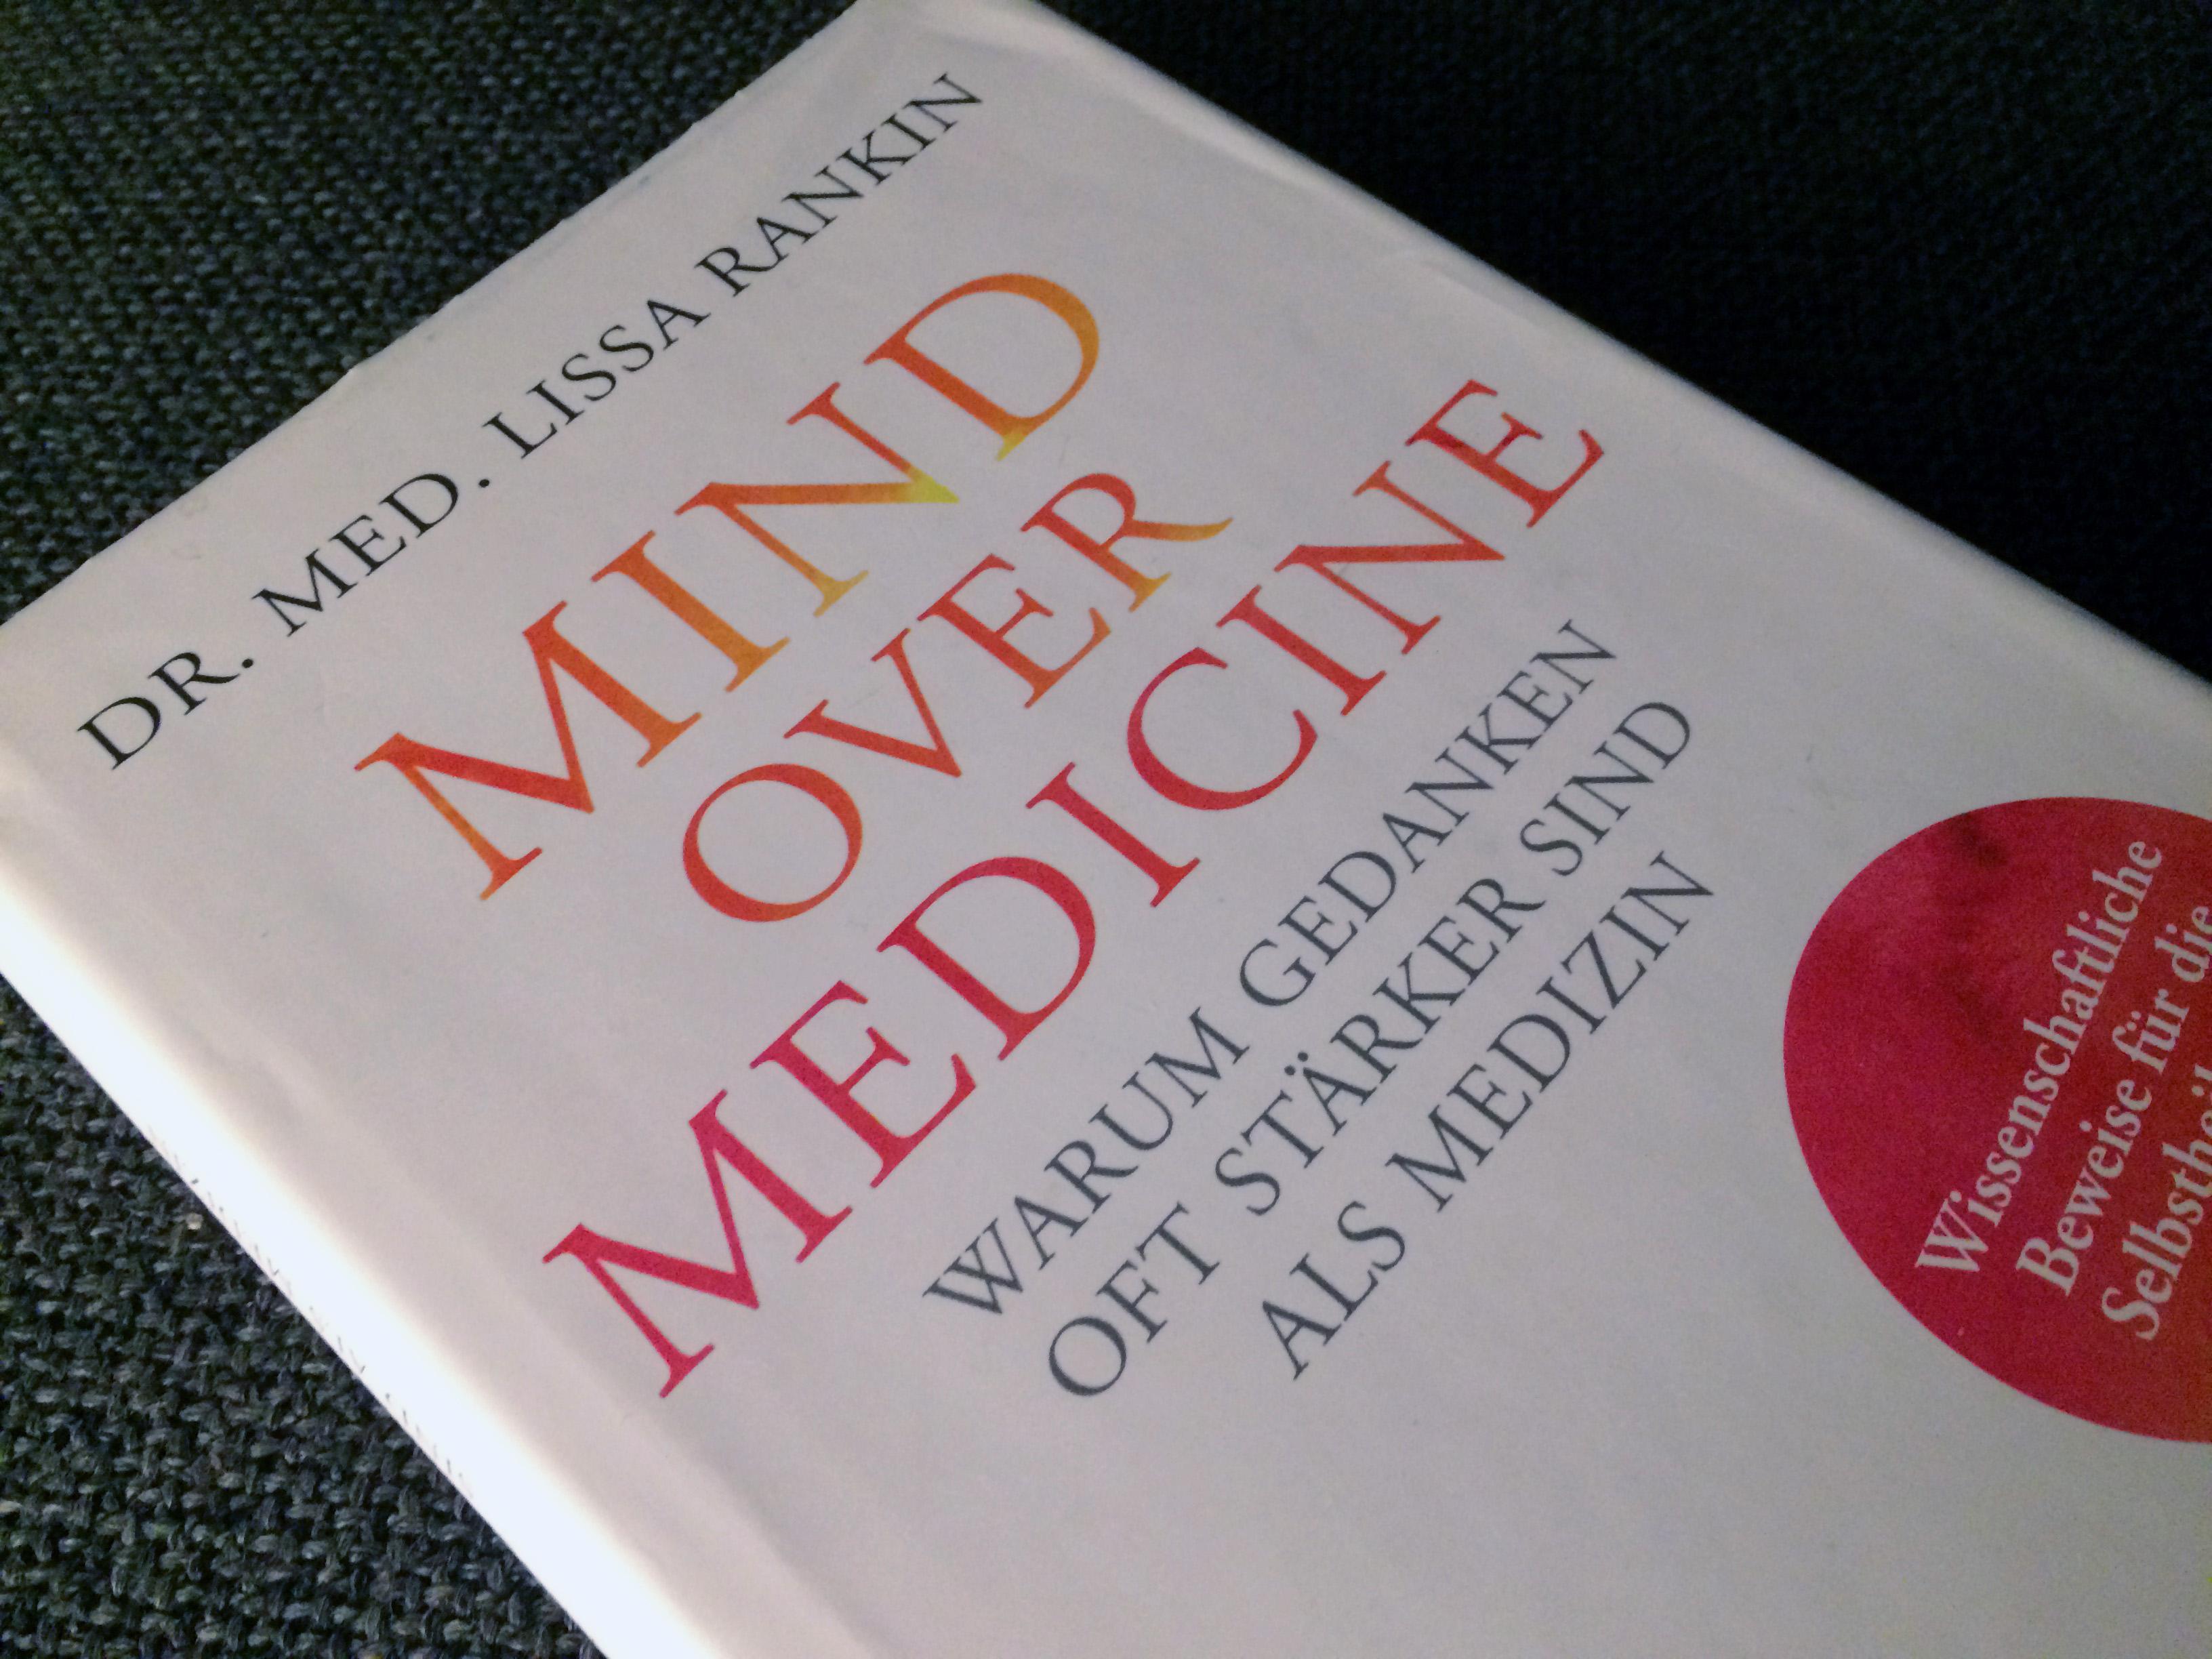 Lissa Rankin - Mind Over Medicine